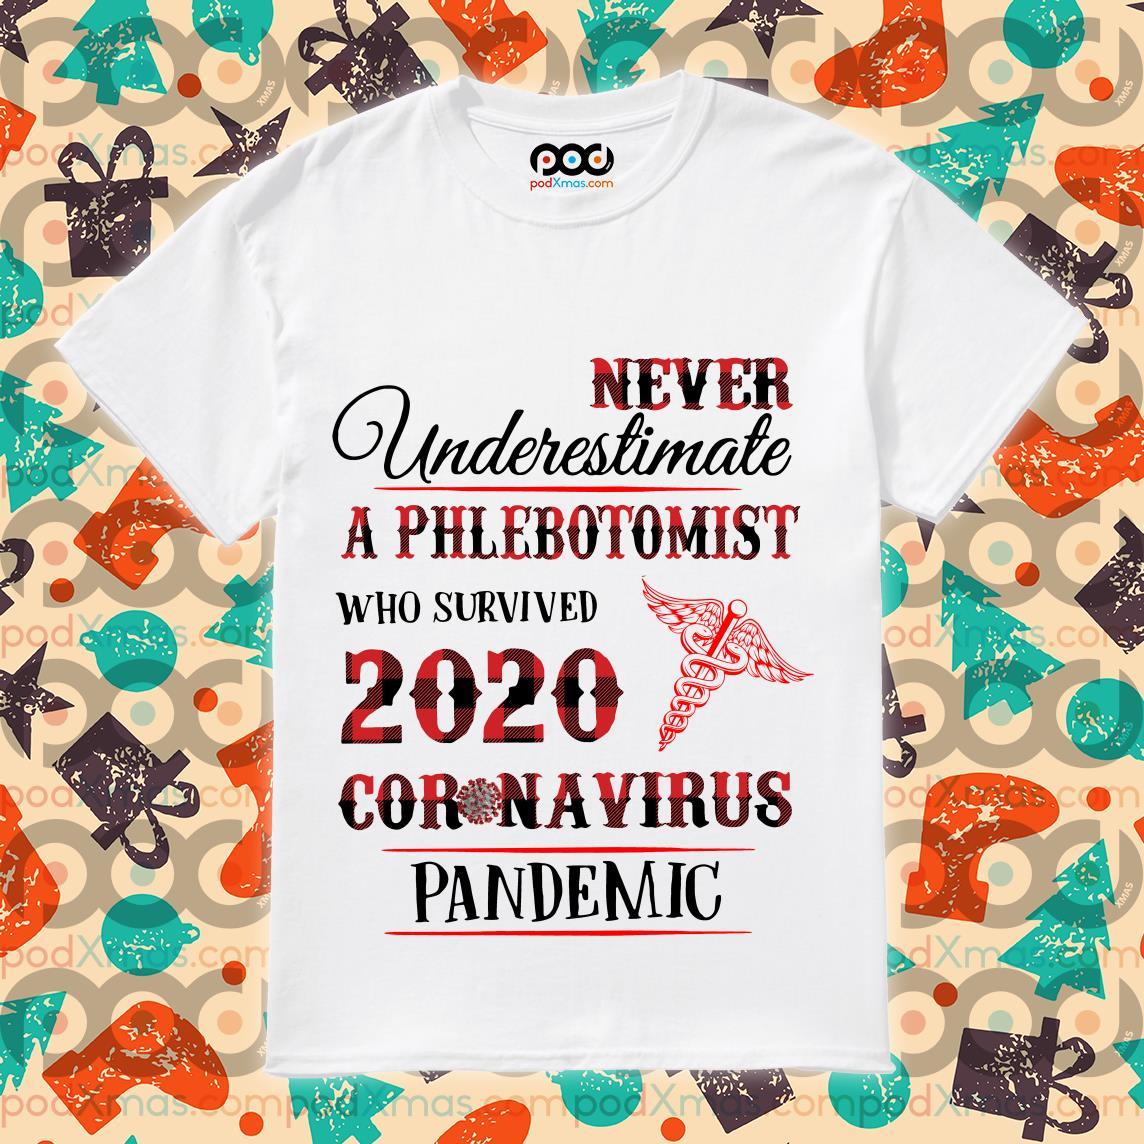 never-underestimate-a-x-ray-tech-2020-coronavirus-pandemic-t-